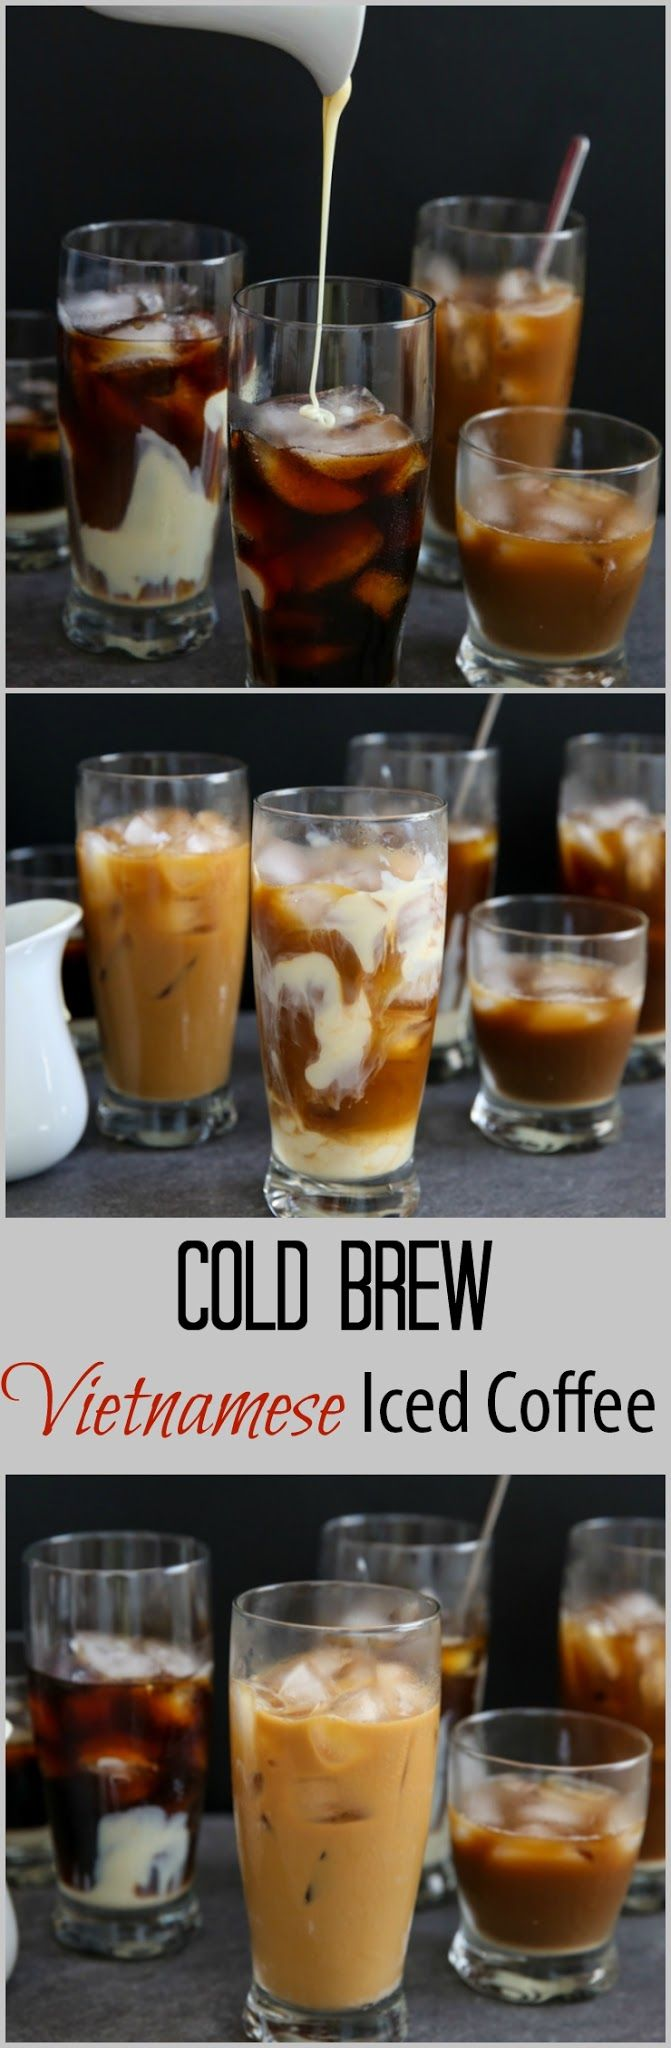 Cold Brew Vietnamese Iced Coffee Recipe Coffee recipes